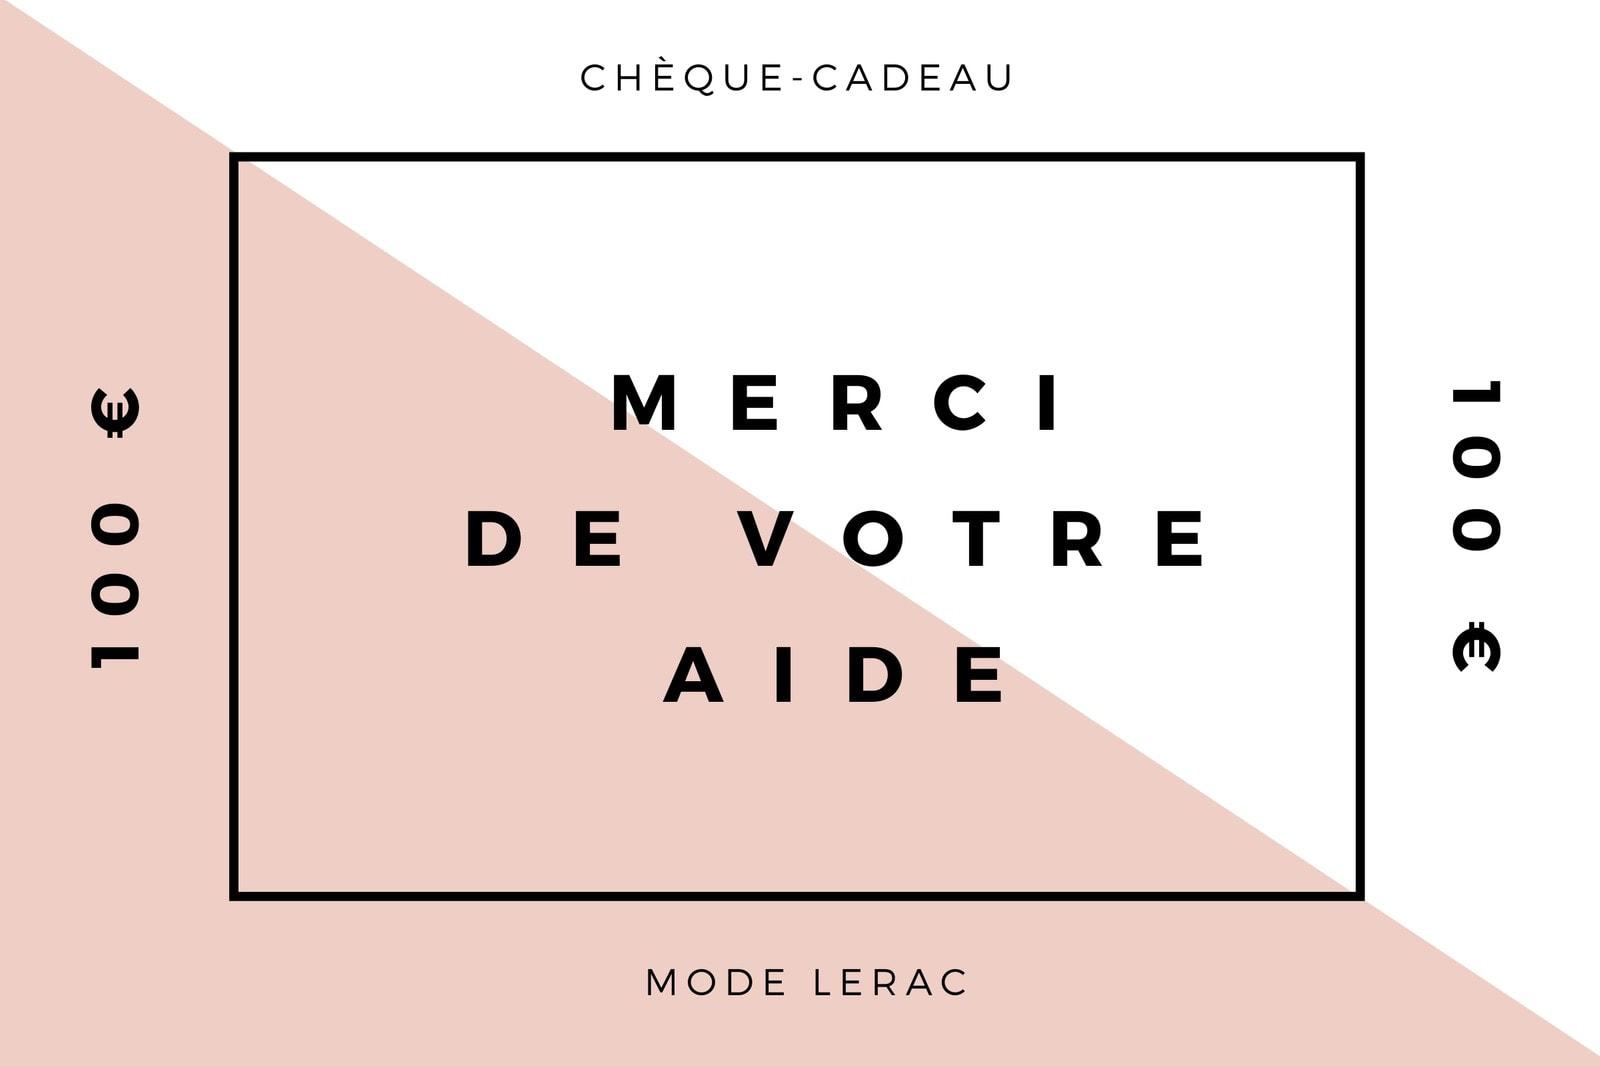 Rose Moderne Minimaliste Mode Bénévole Chèque-Cadeau